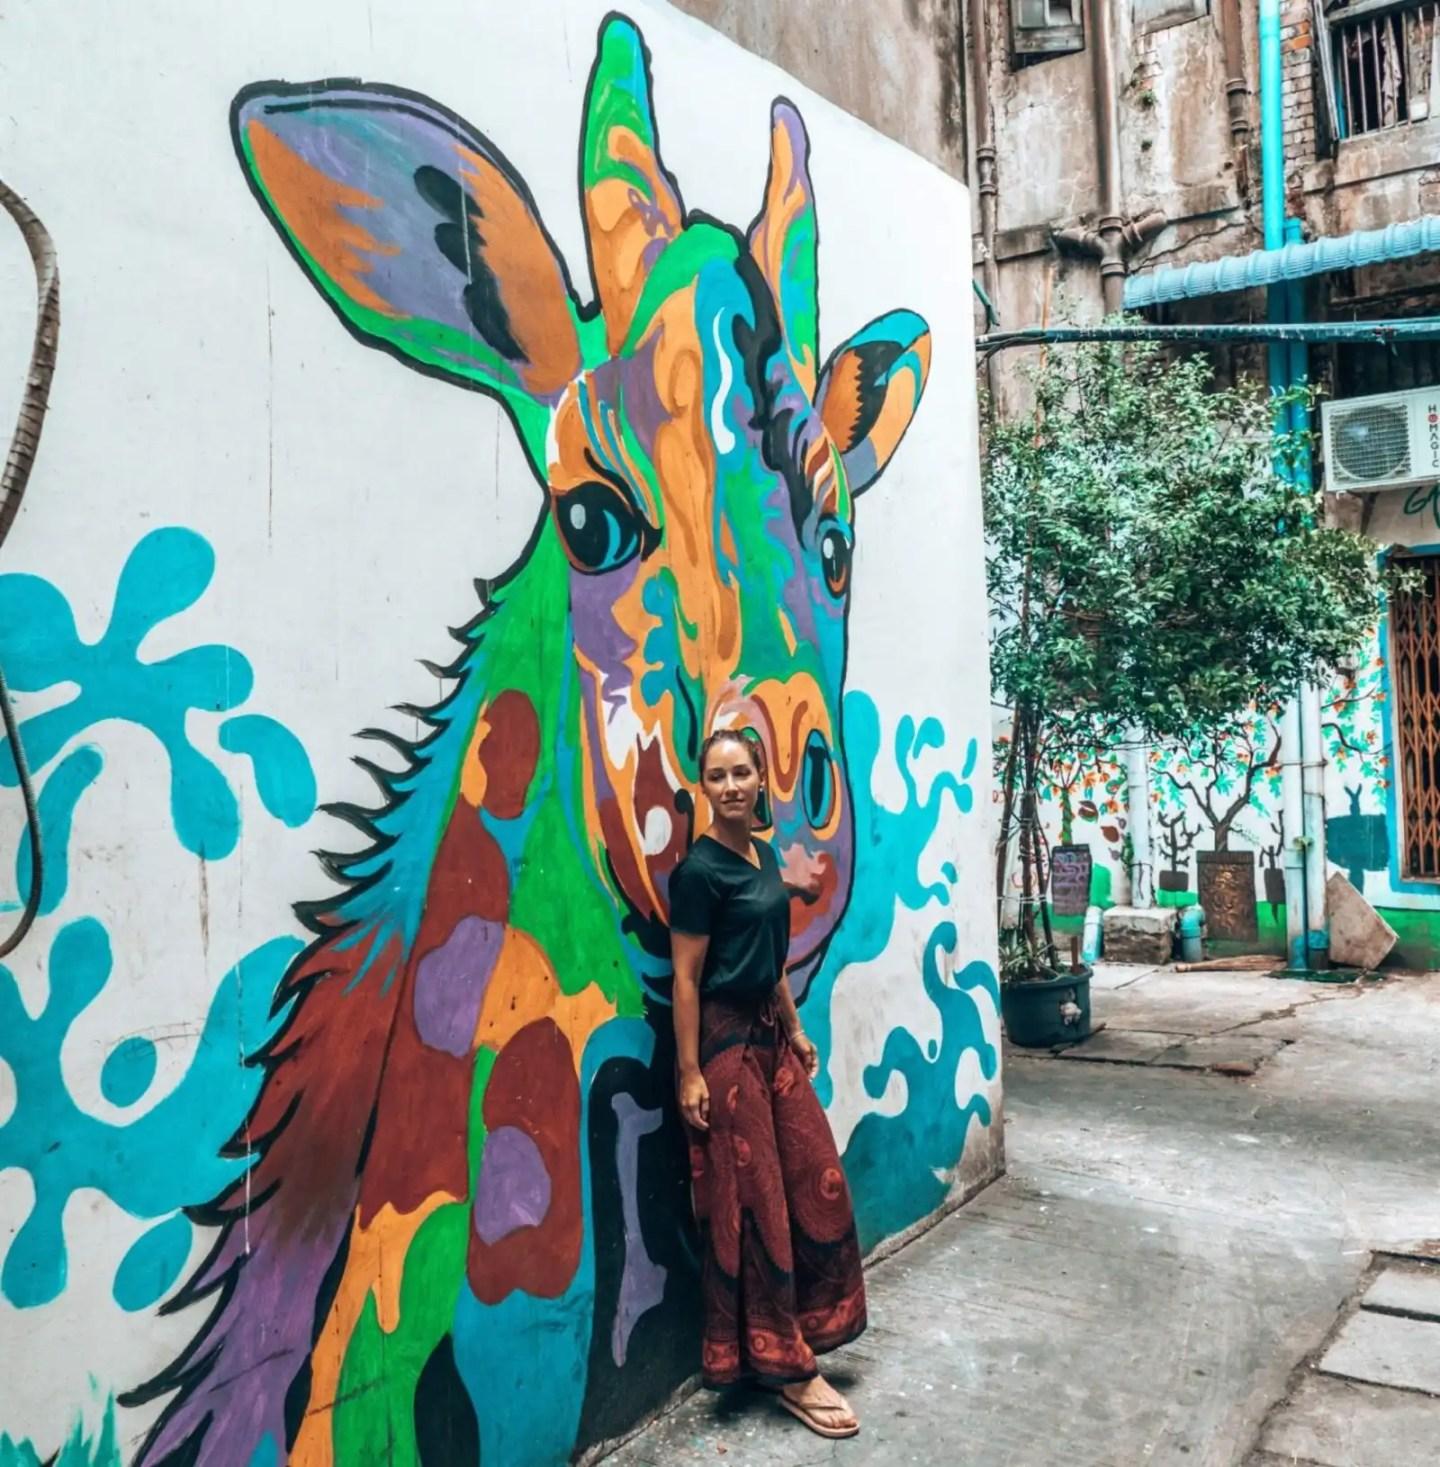 Yangon Street Art Giraffe and Lee